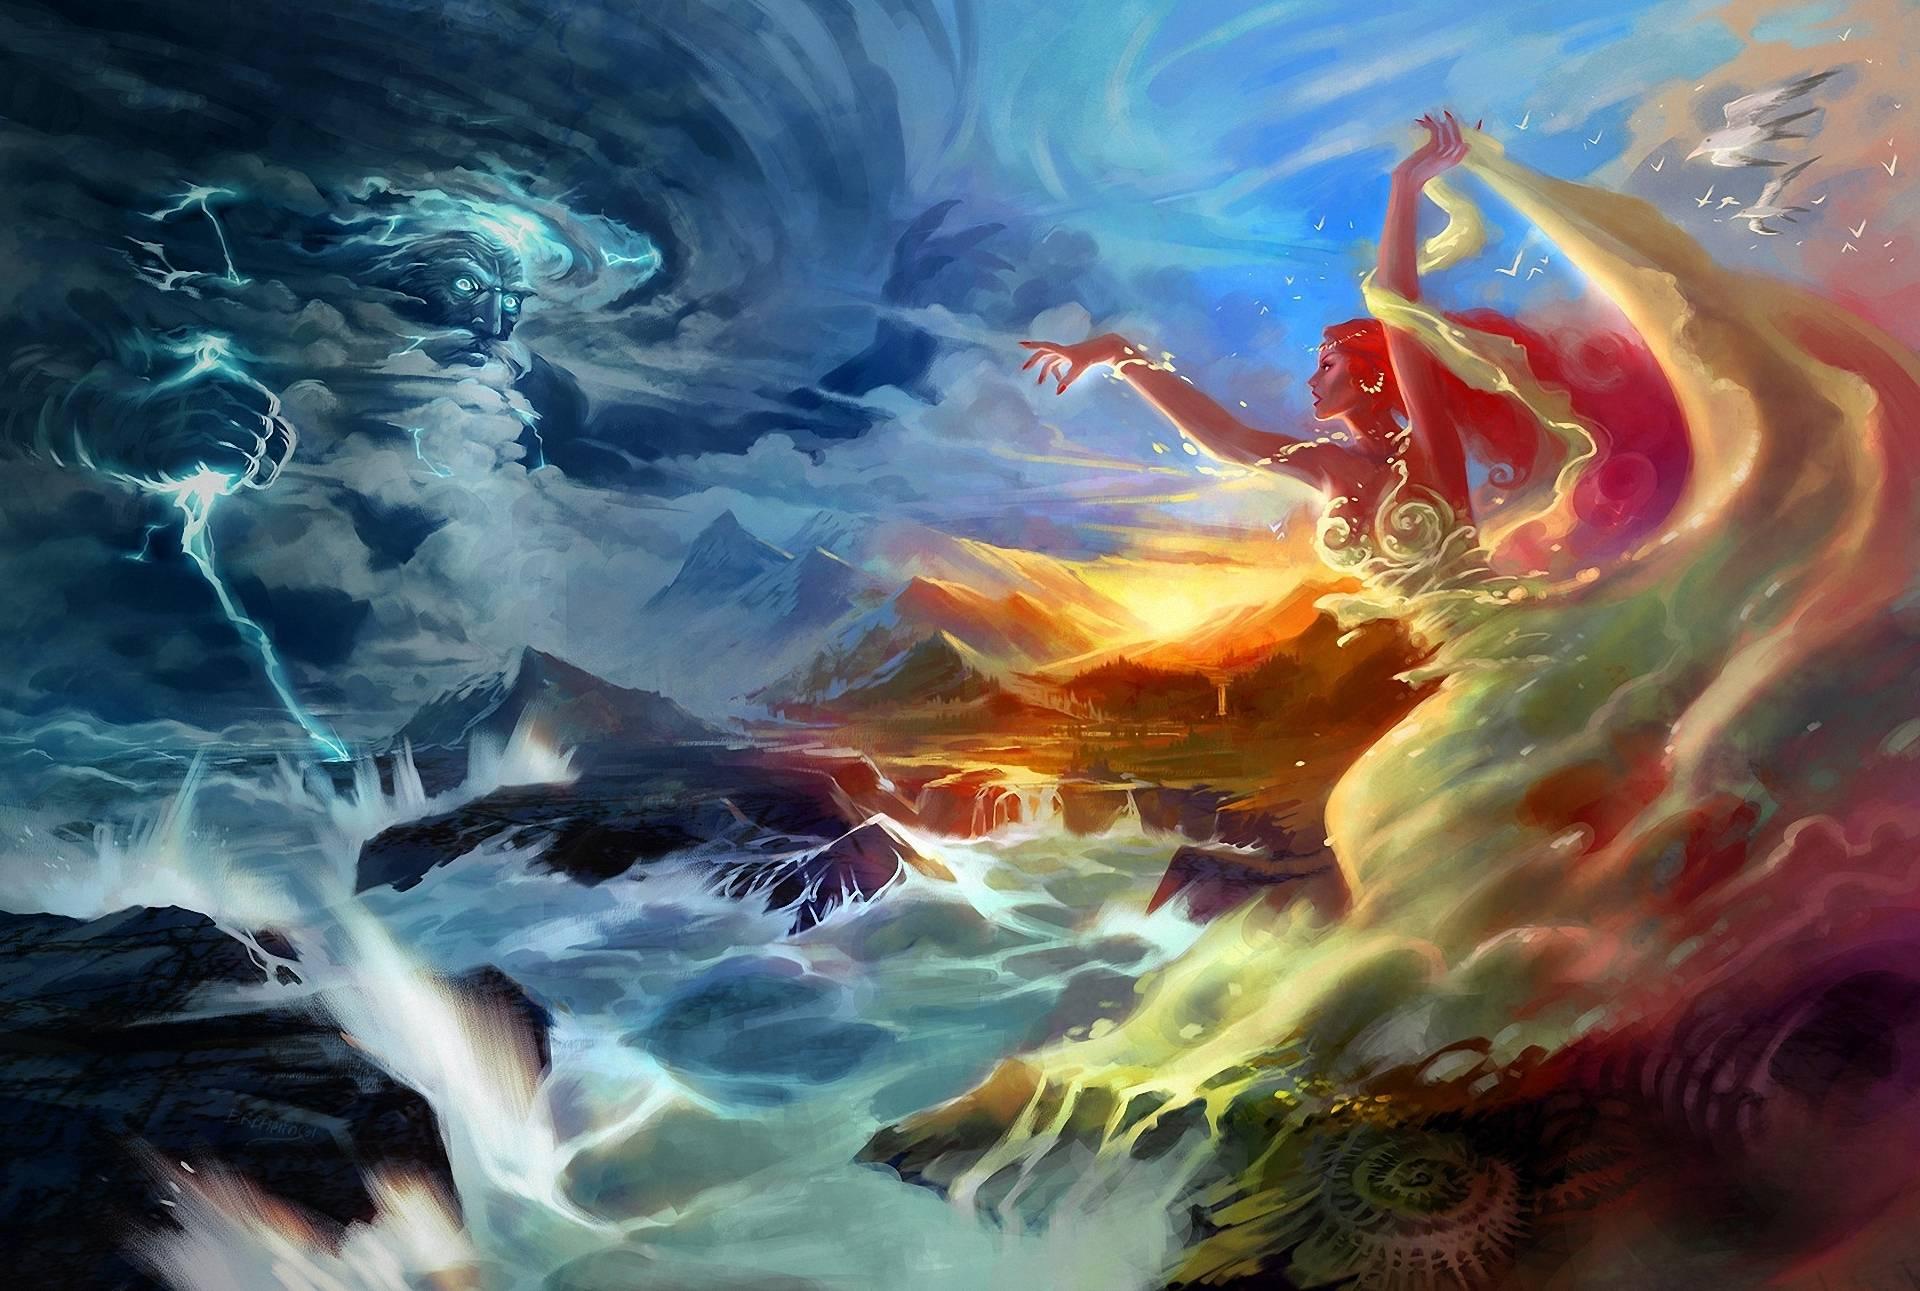 lightning art wallpaper - photo #47